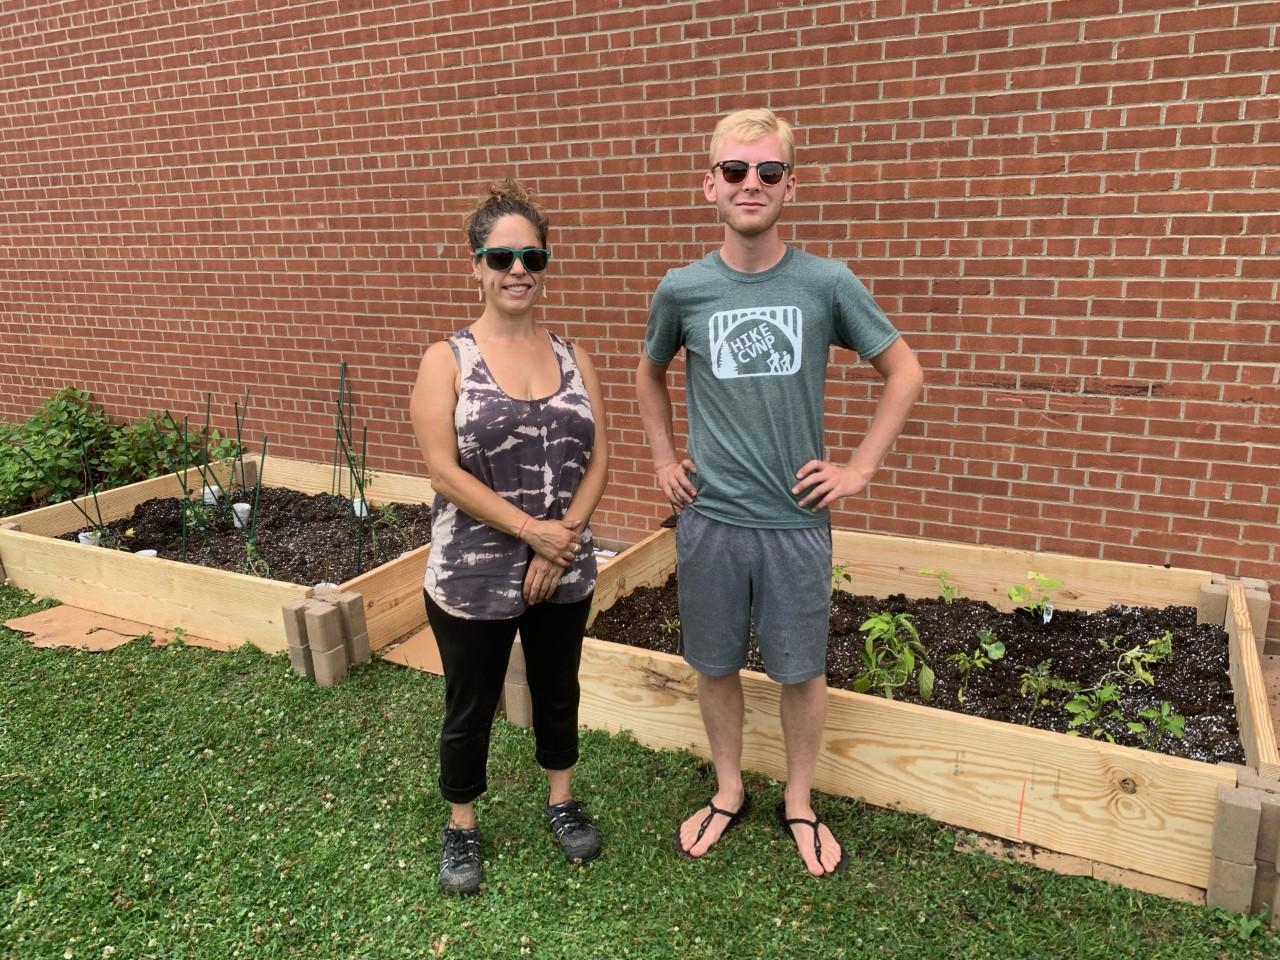 CSU Alumna and Student Encourage Community Wellness Through Fresh Foods